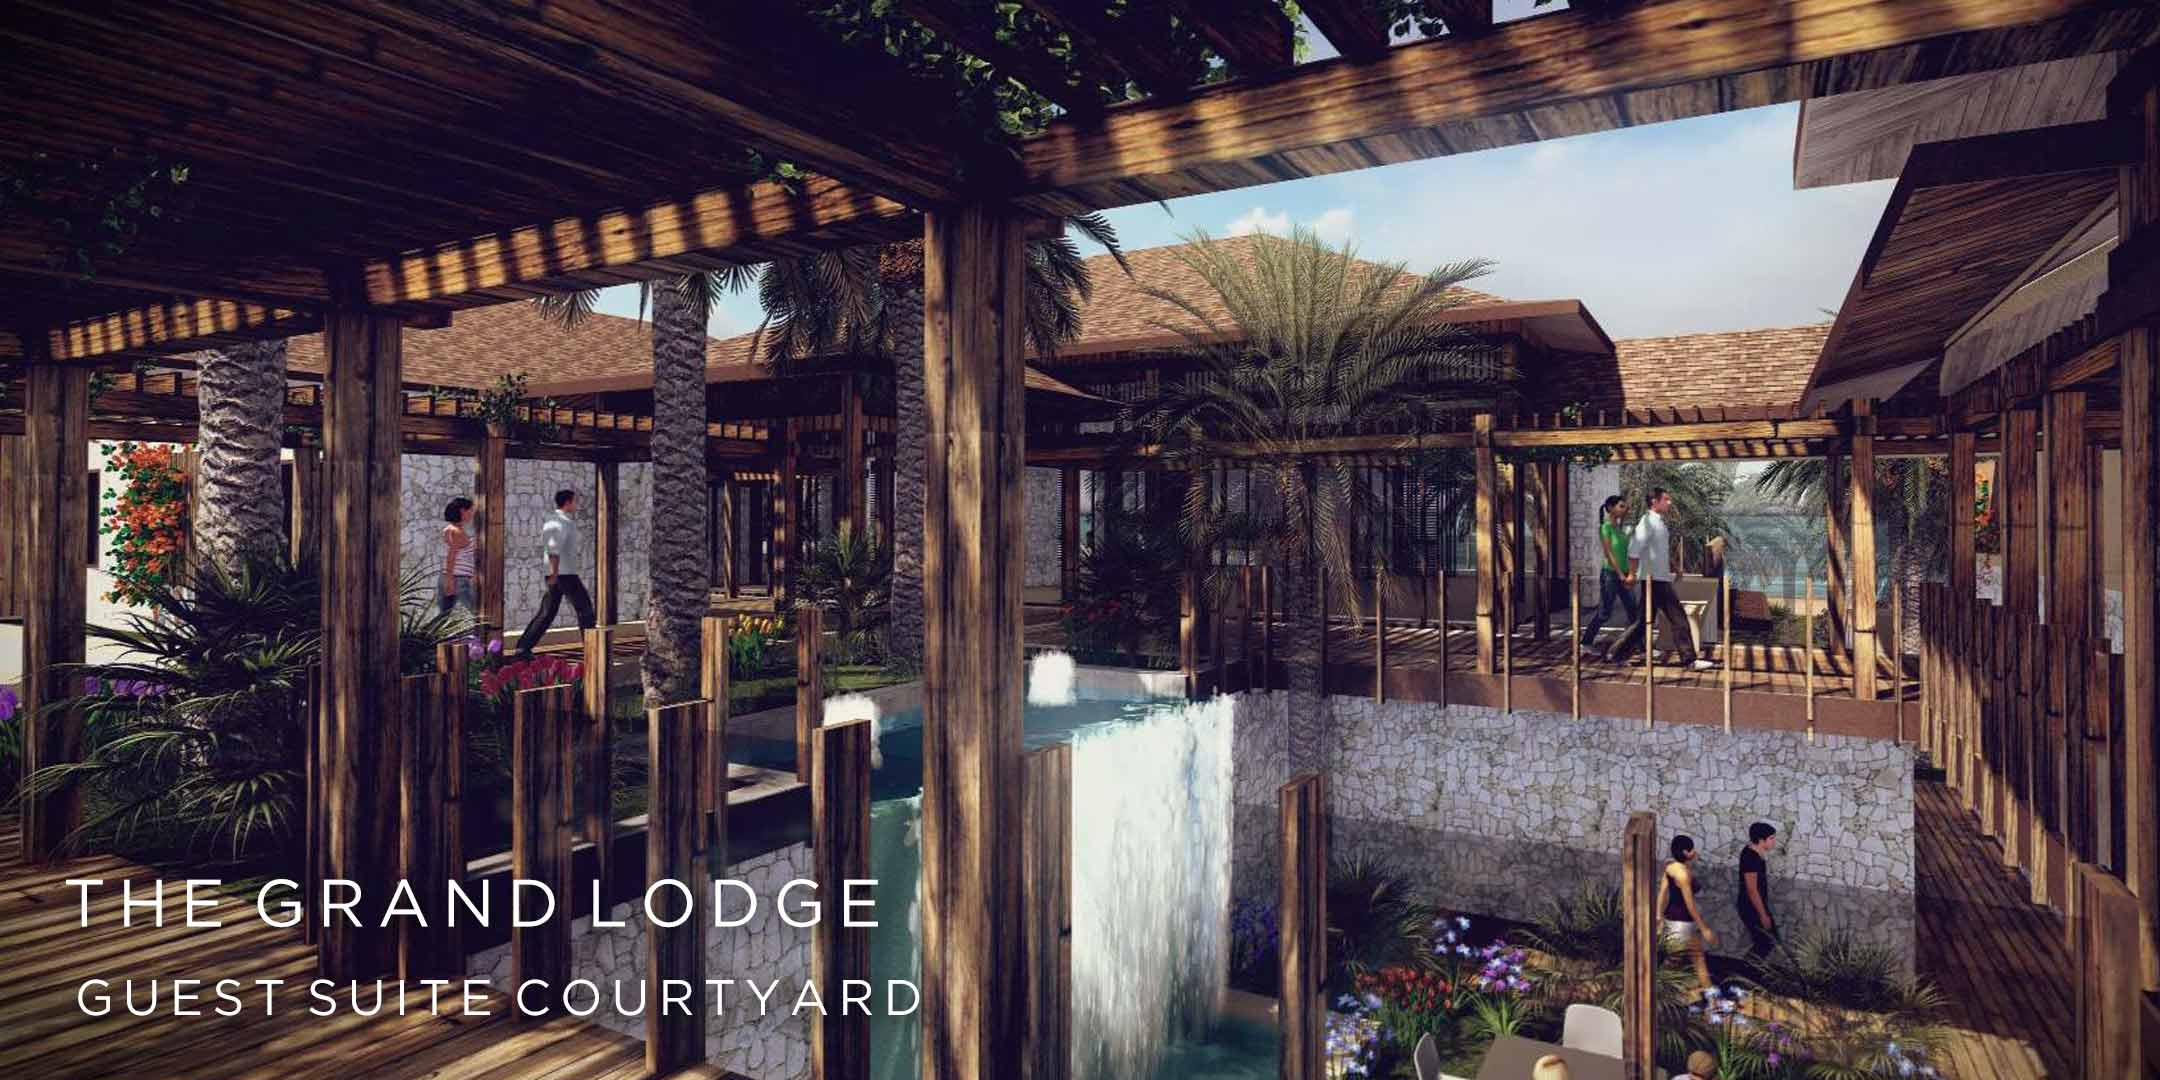 GL-GS-Courtyard-Image-Rectangle-2160x1080